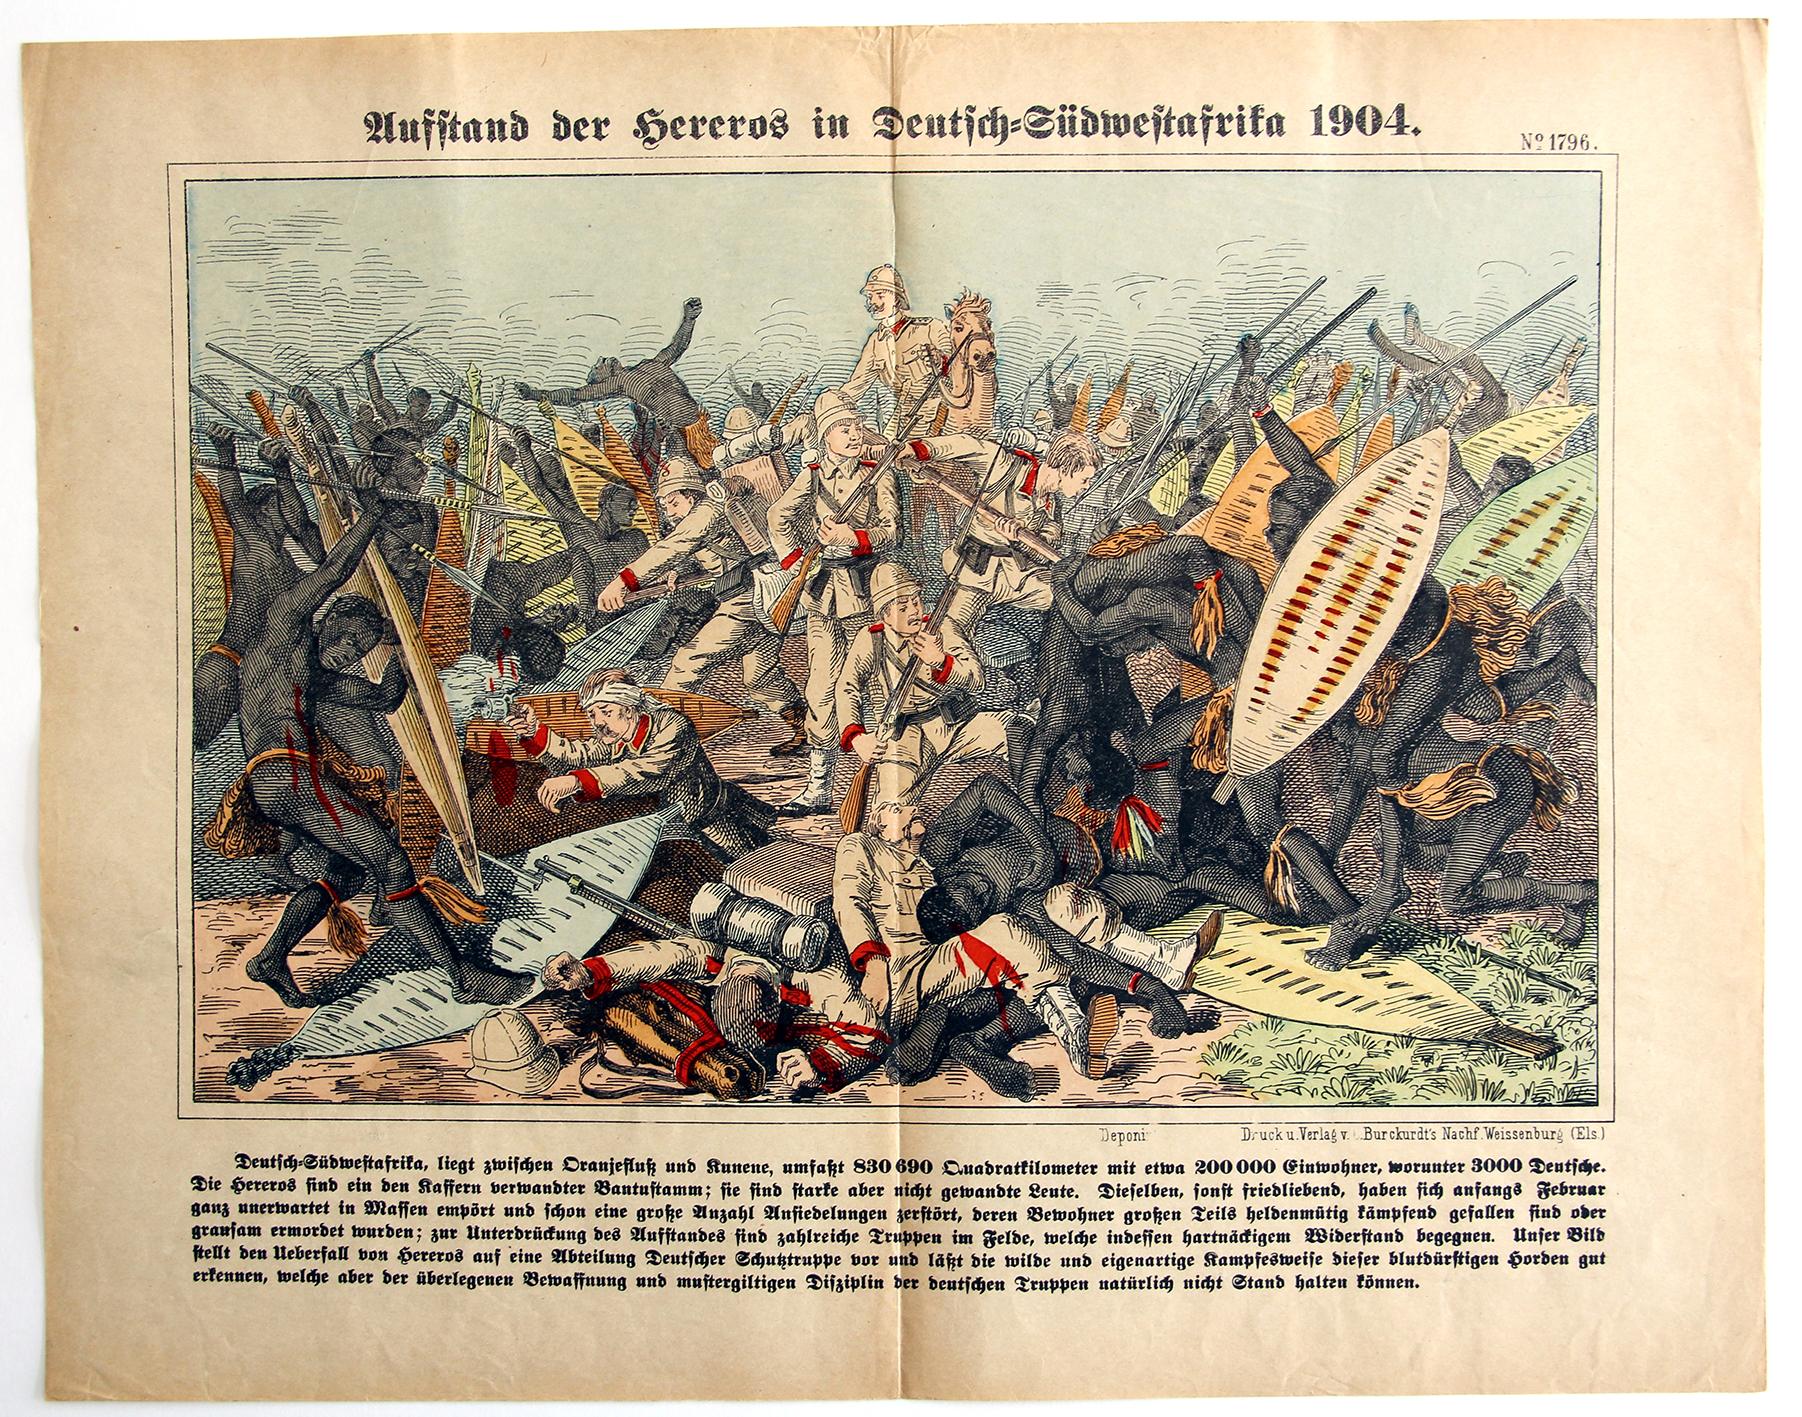 Planche imagerie Wissembourg - C.Burckardt - Ausstand der Hereros - Allemagne Colonie - Imagerie Populaire - 1904 - Deutsch-Südwestafrika